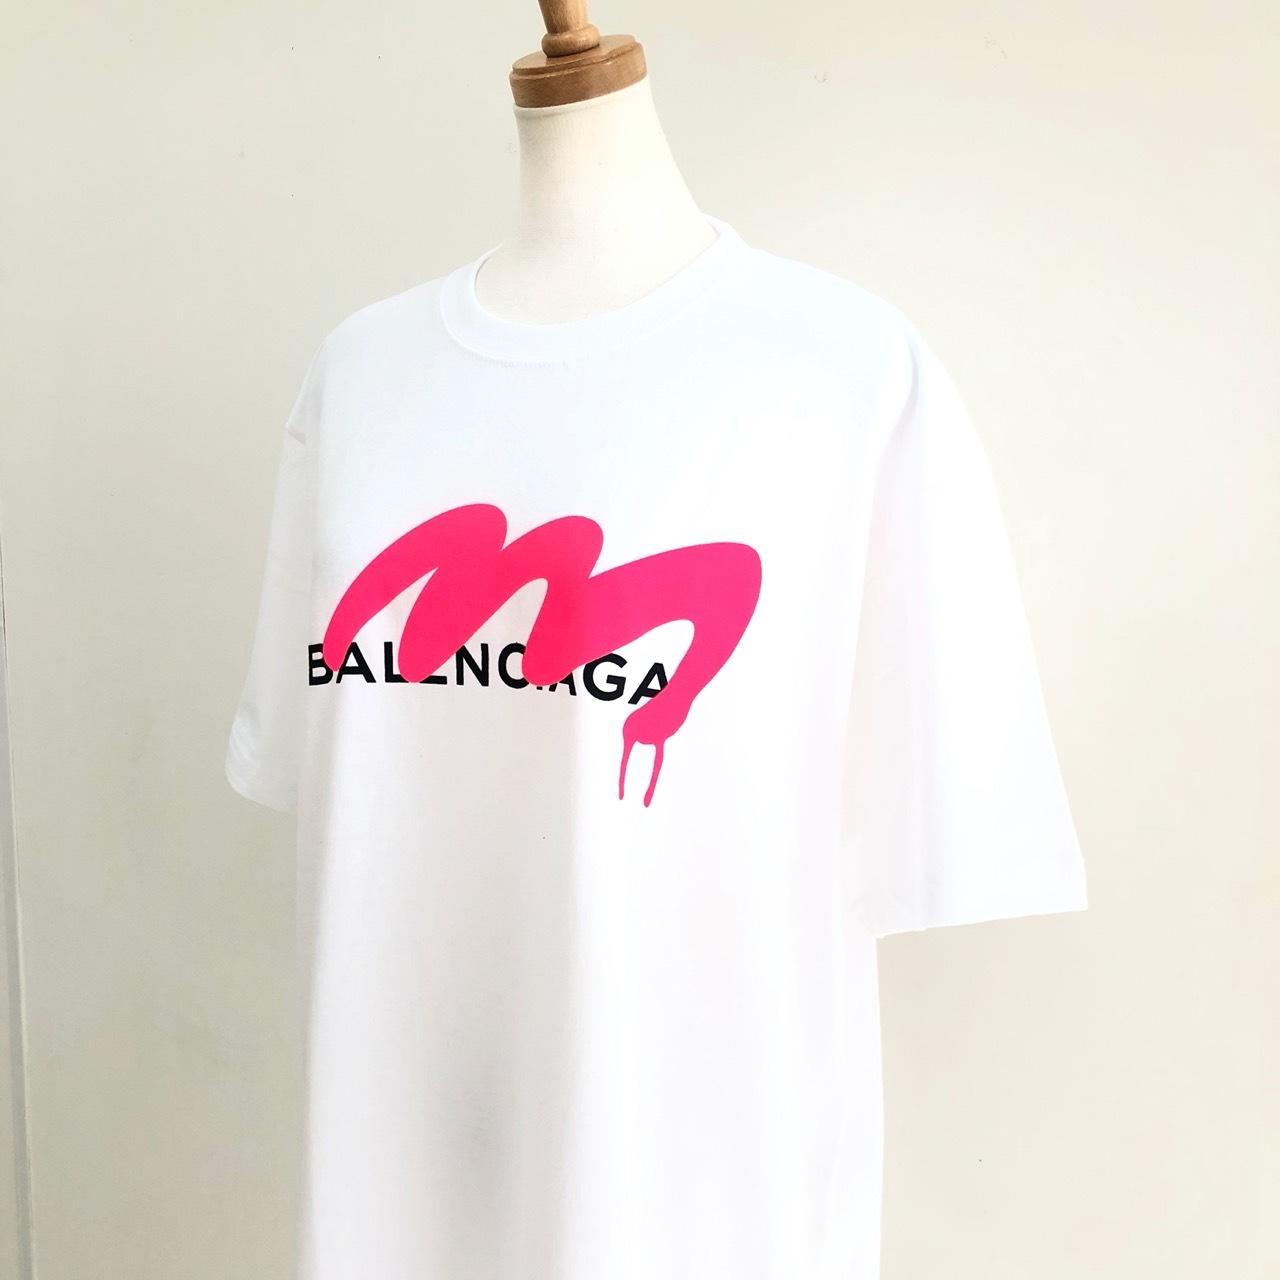 【 Valance Select 】- 11105 - プリントTシャツ